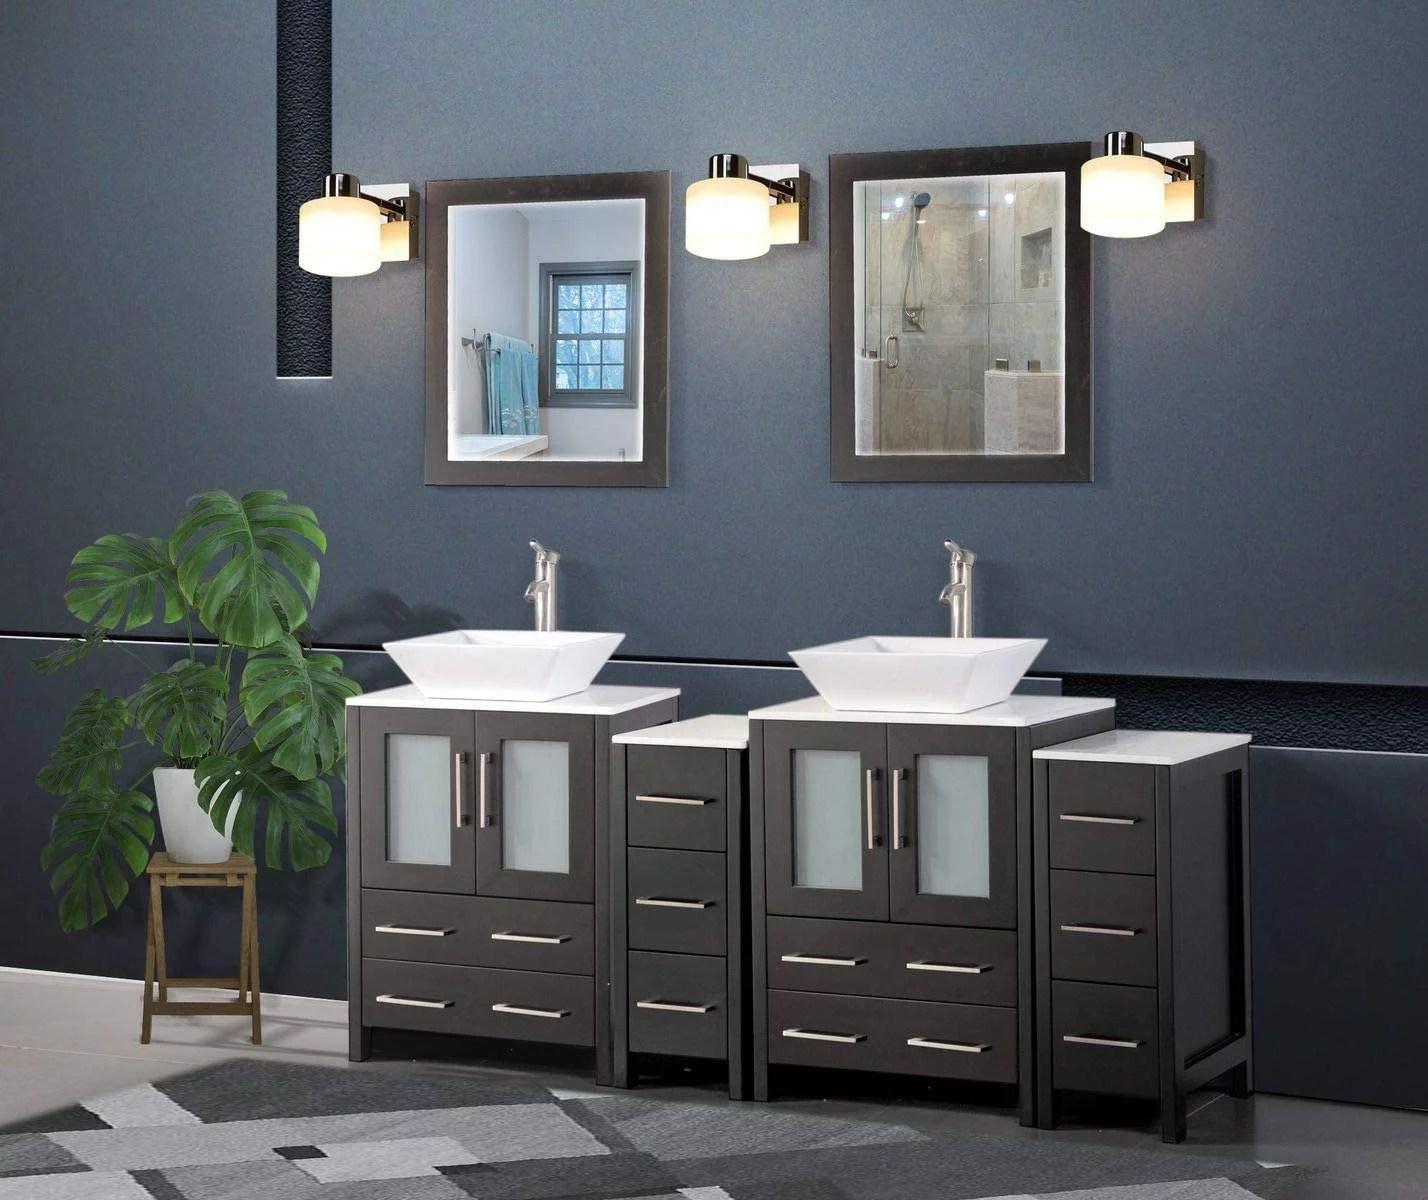 vanity art 72 inches double sink bathroom vanity compact set 4 cabinets 2 shelves 10 drawers quartz top and ceramic vessel sink bathroom cabinet